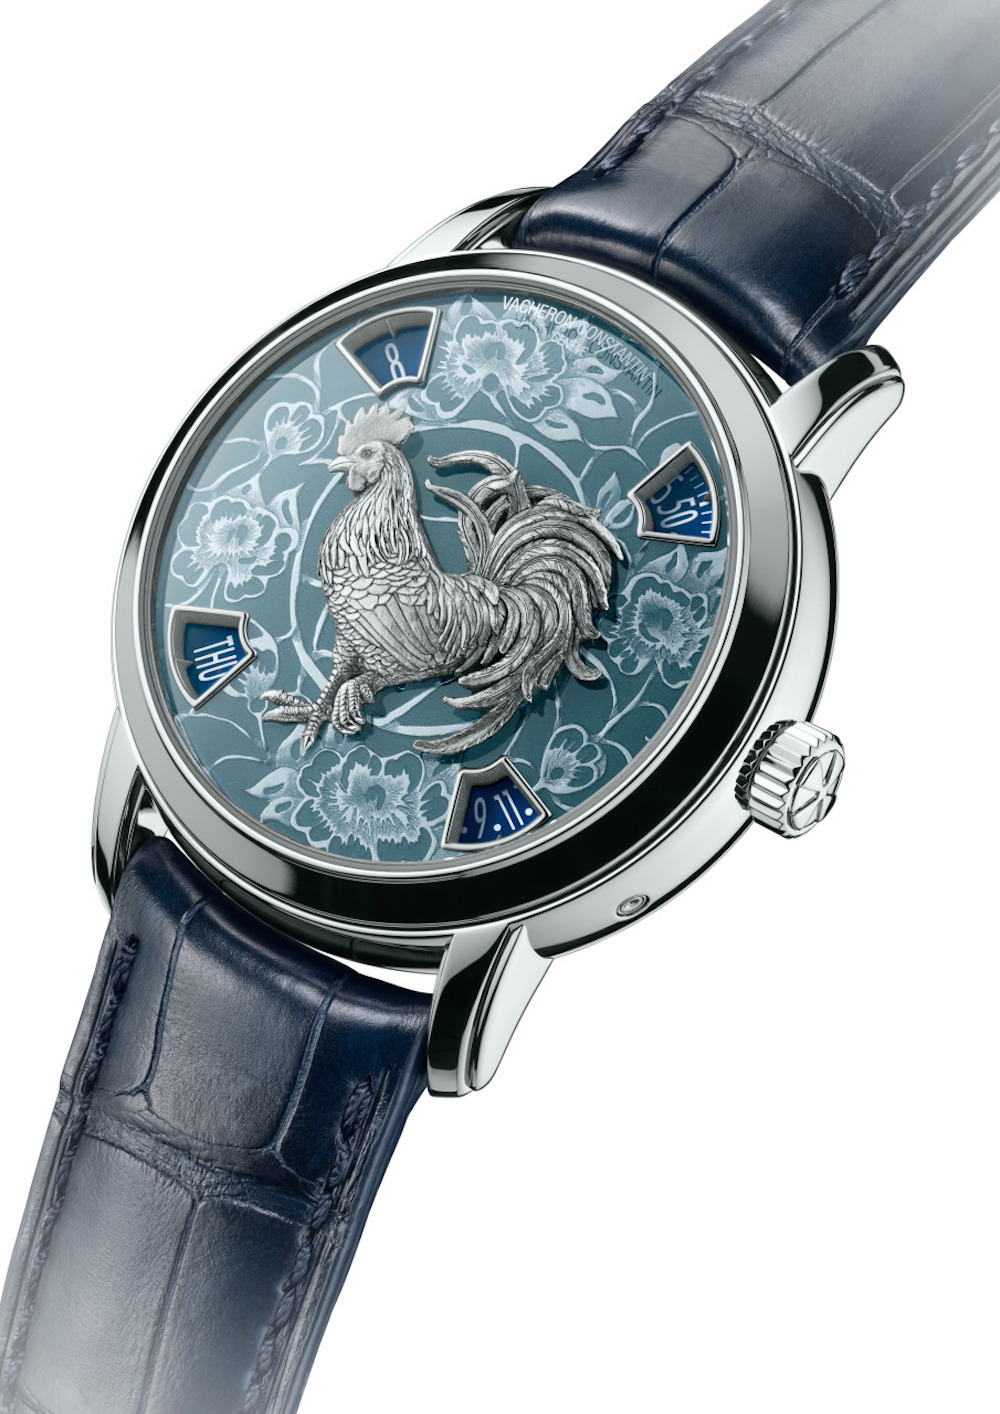 montres de + de 1000 euros - Page 41 86073-000p-b154-r-tr-1344216